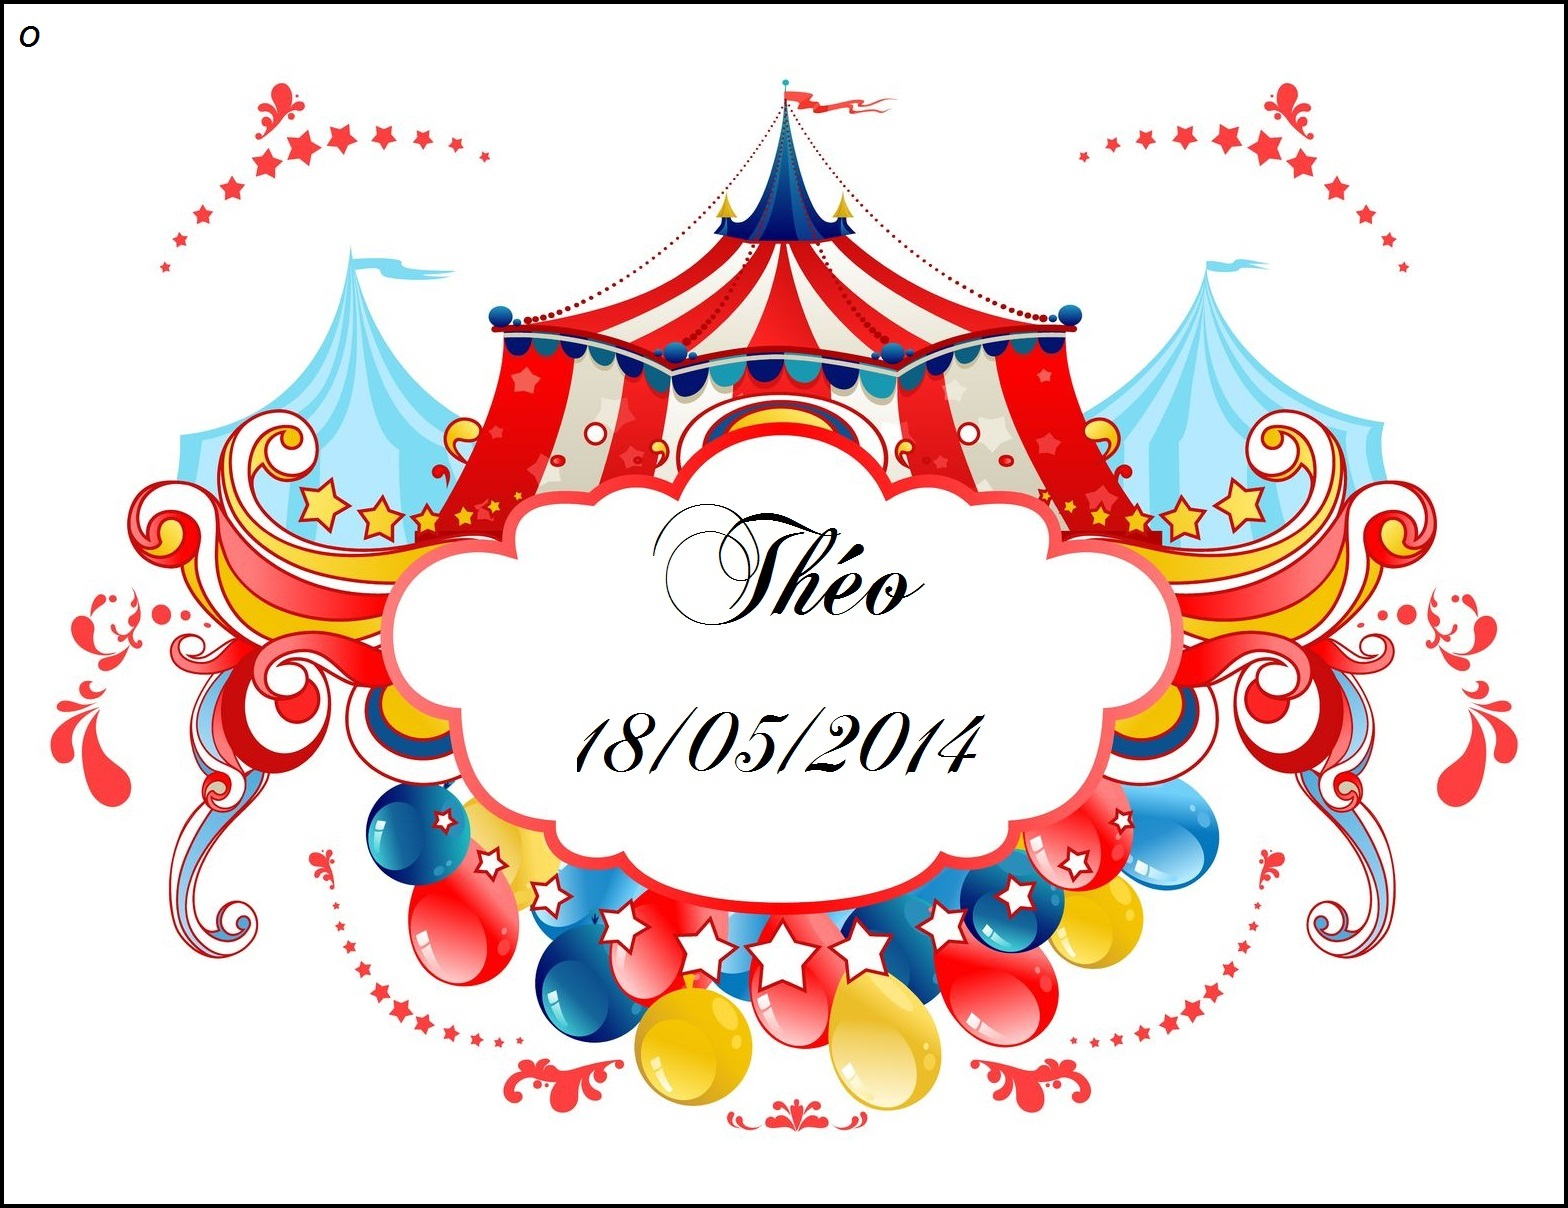 Etiquettes a dragees cirque 1